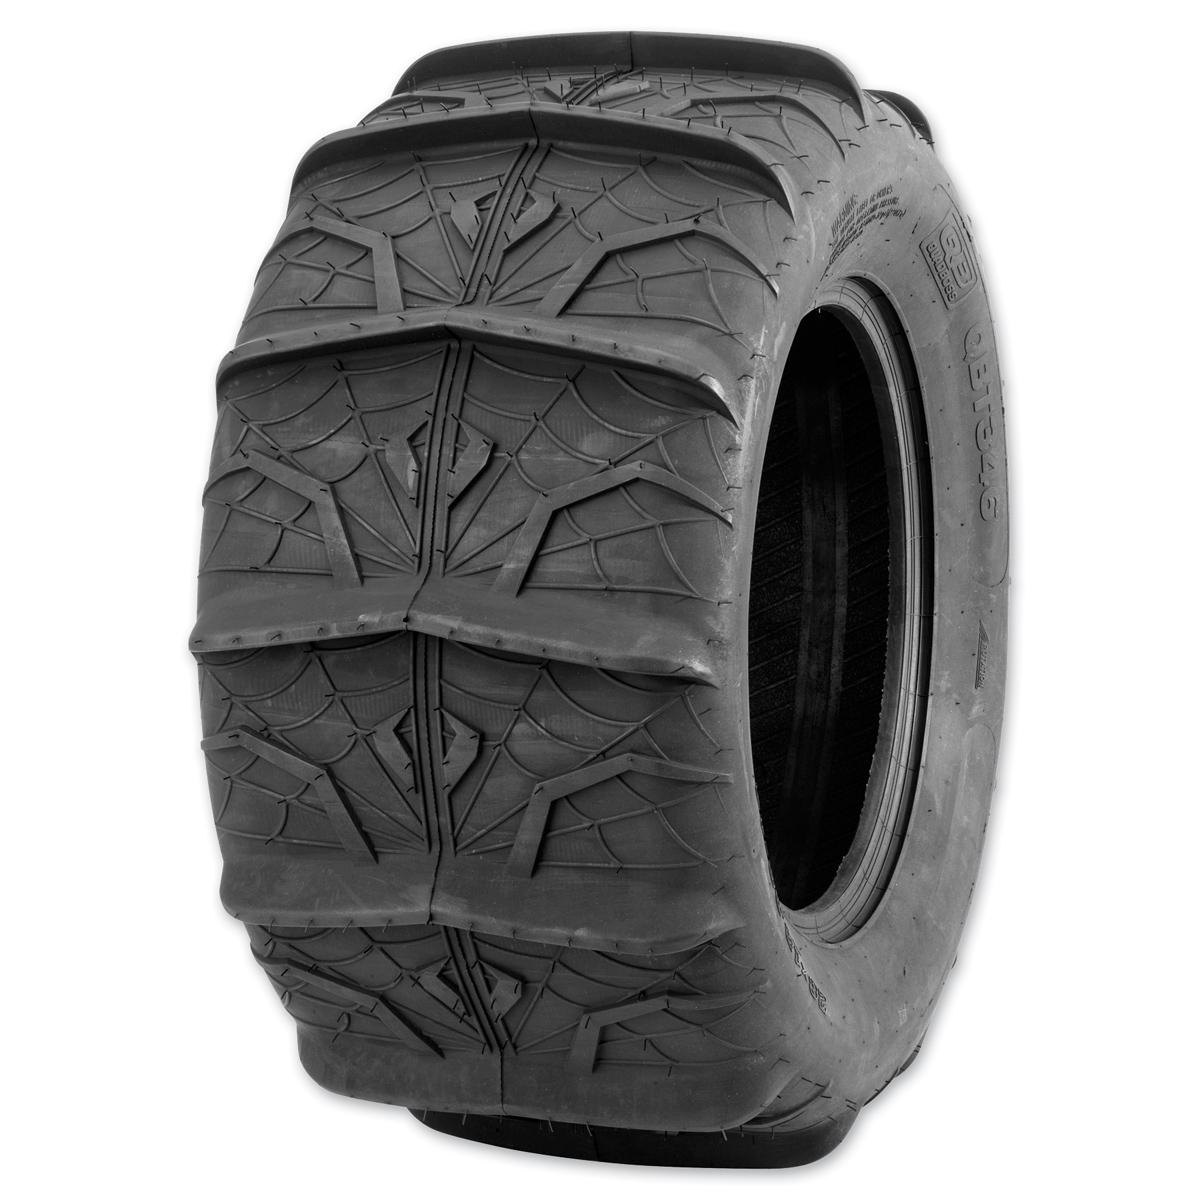 Quadboss QBT346 Sand 30X14-14 6-Ply Rear Tire